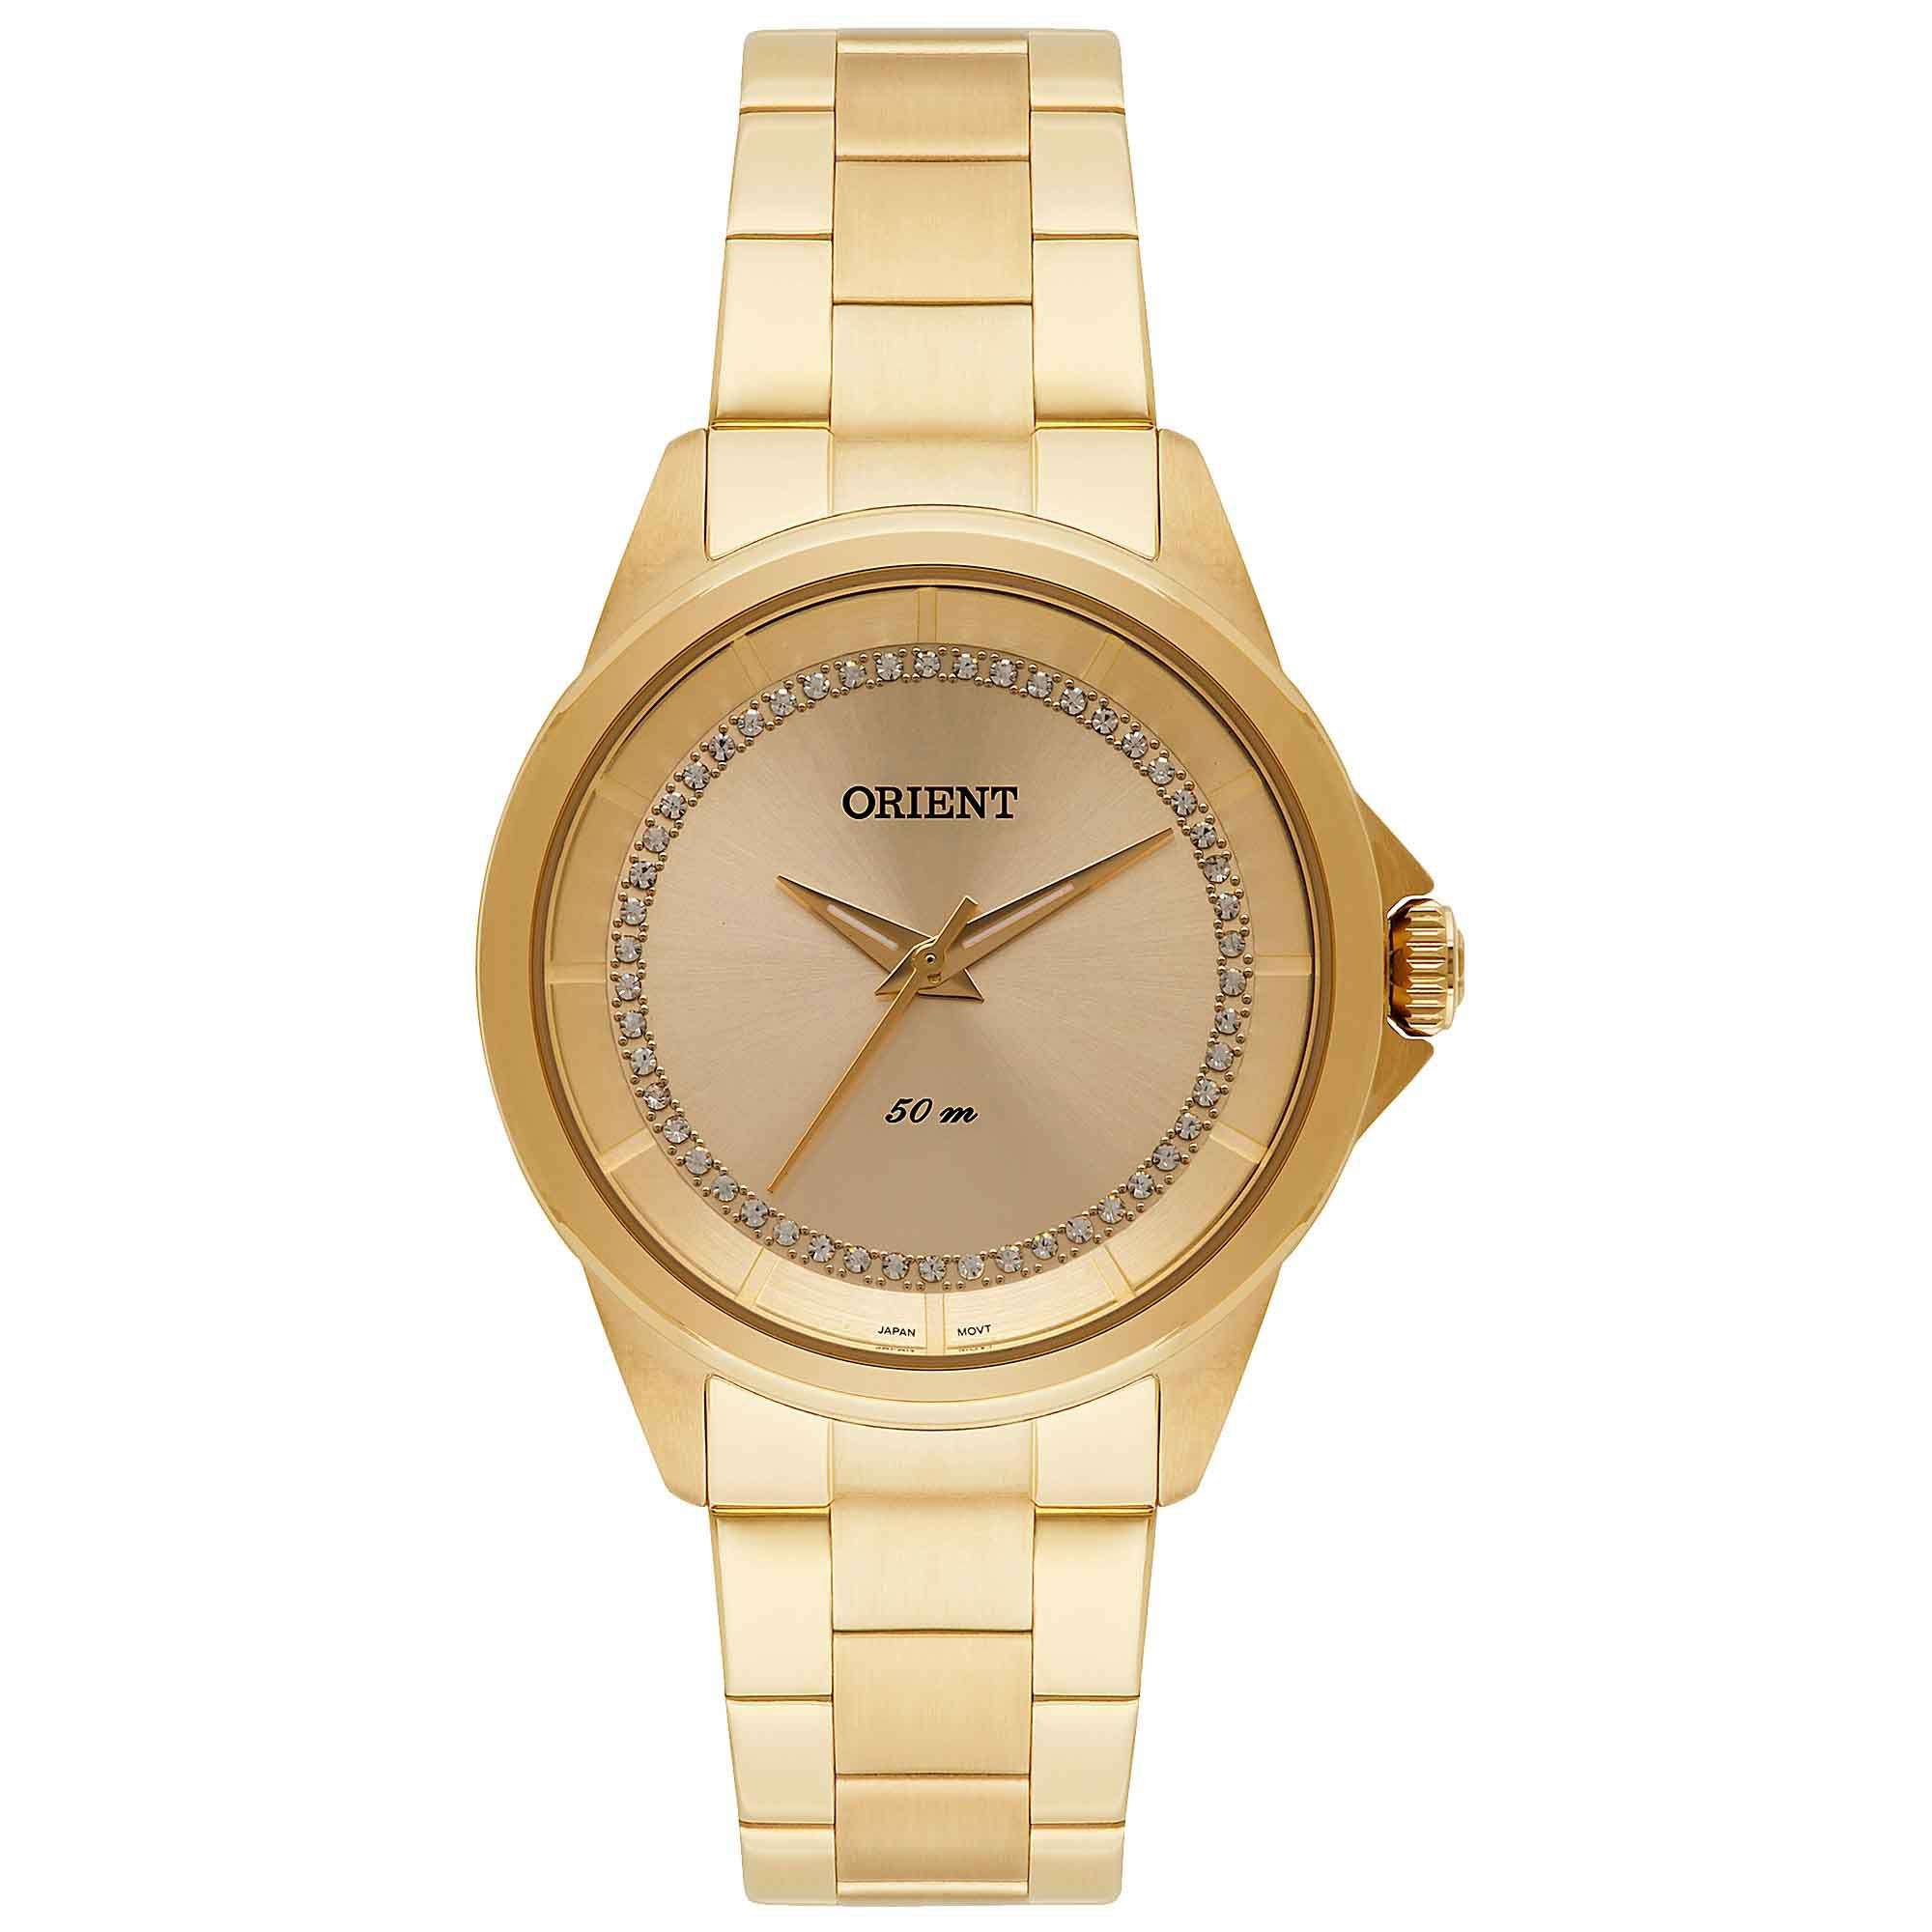 Relógio Feminino Orient FGSS0076 C1KX